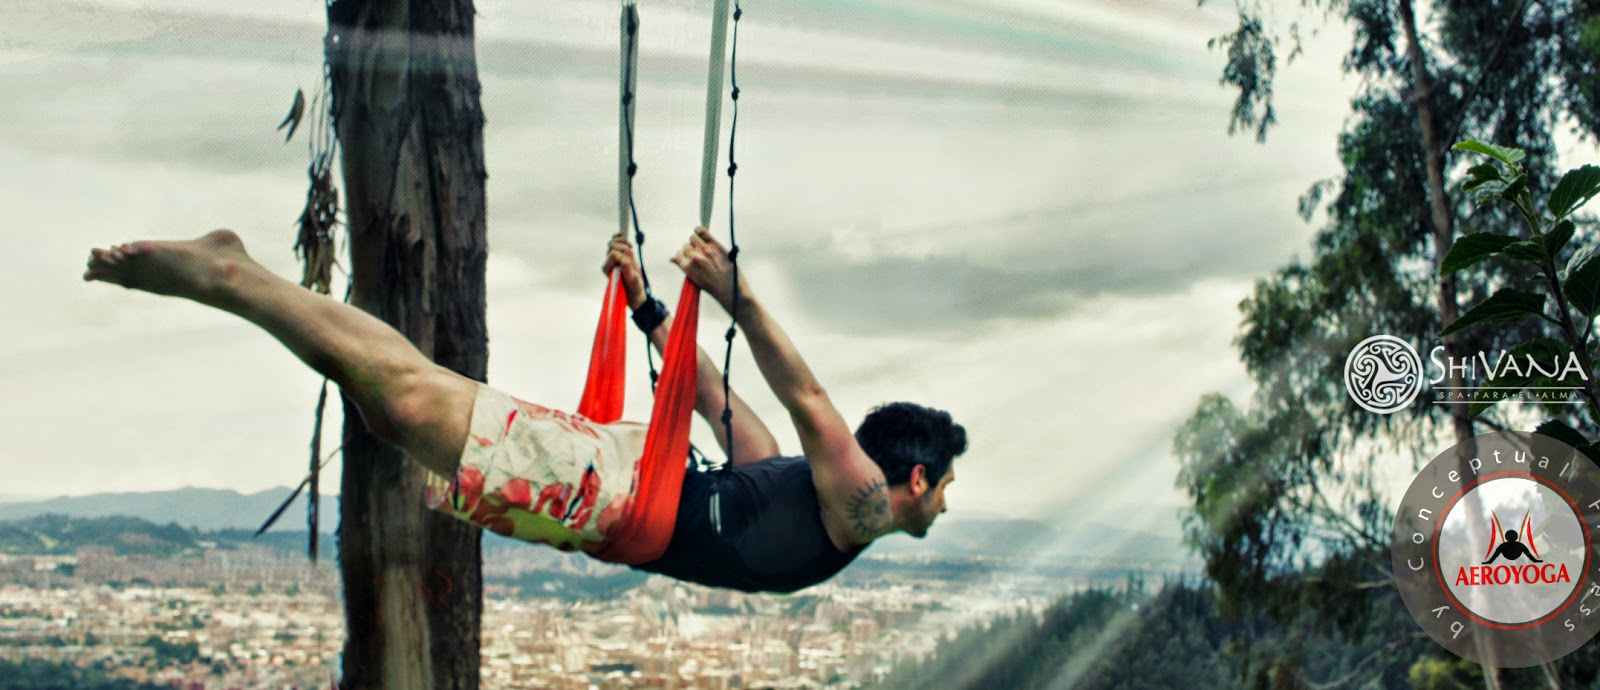 aerialyoga yoga aereo aero yoga Rafael Martinez